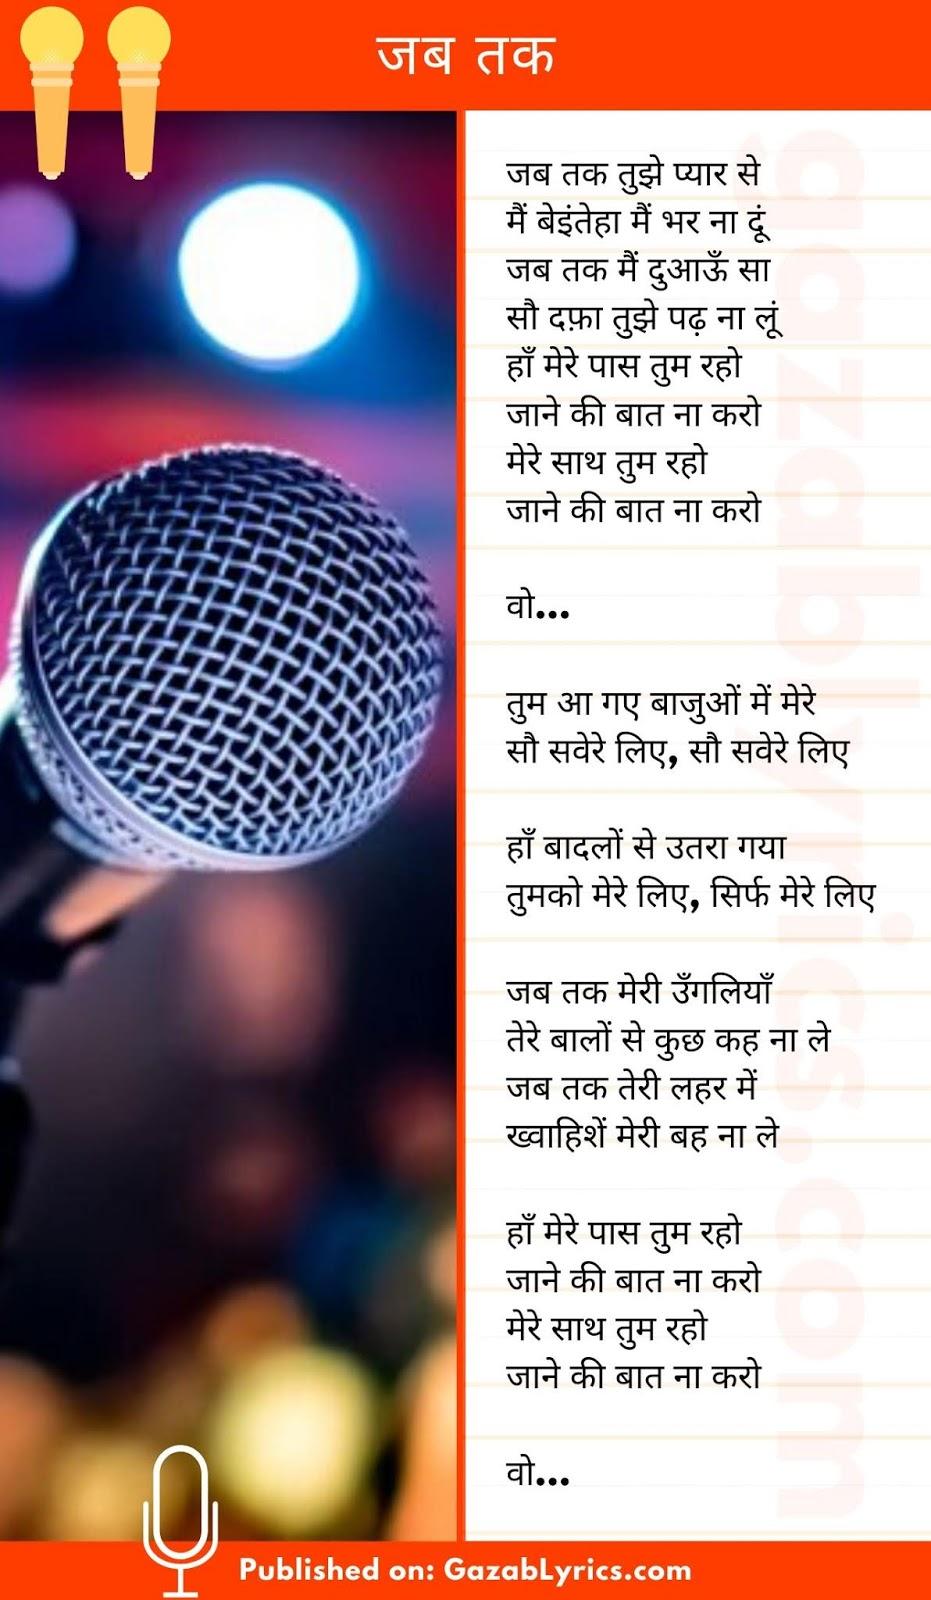 Jab Tak song lyrics image